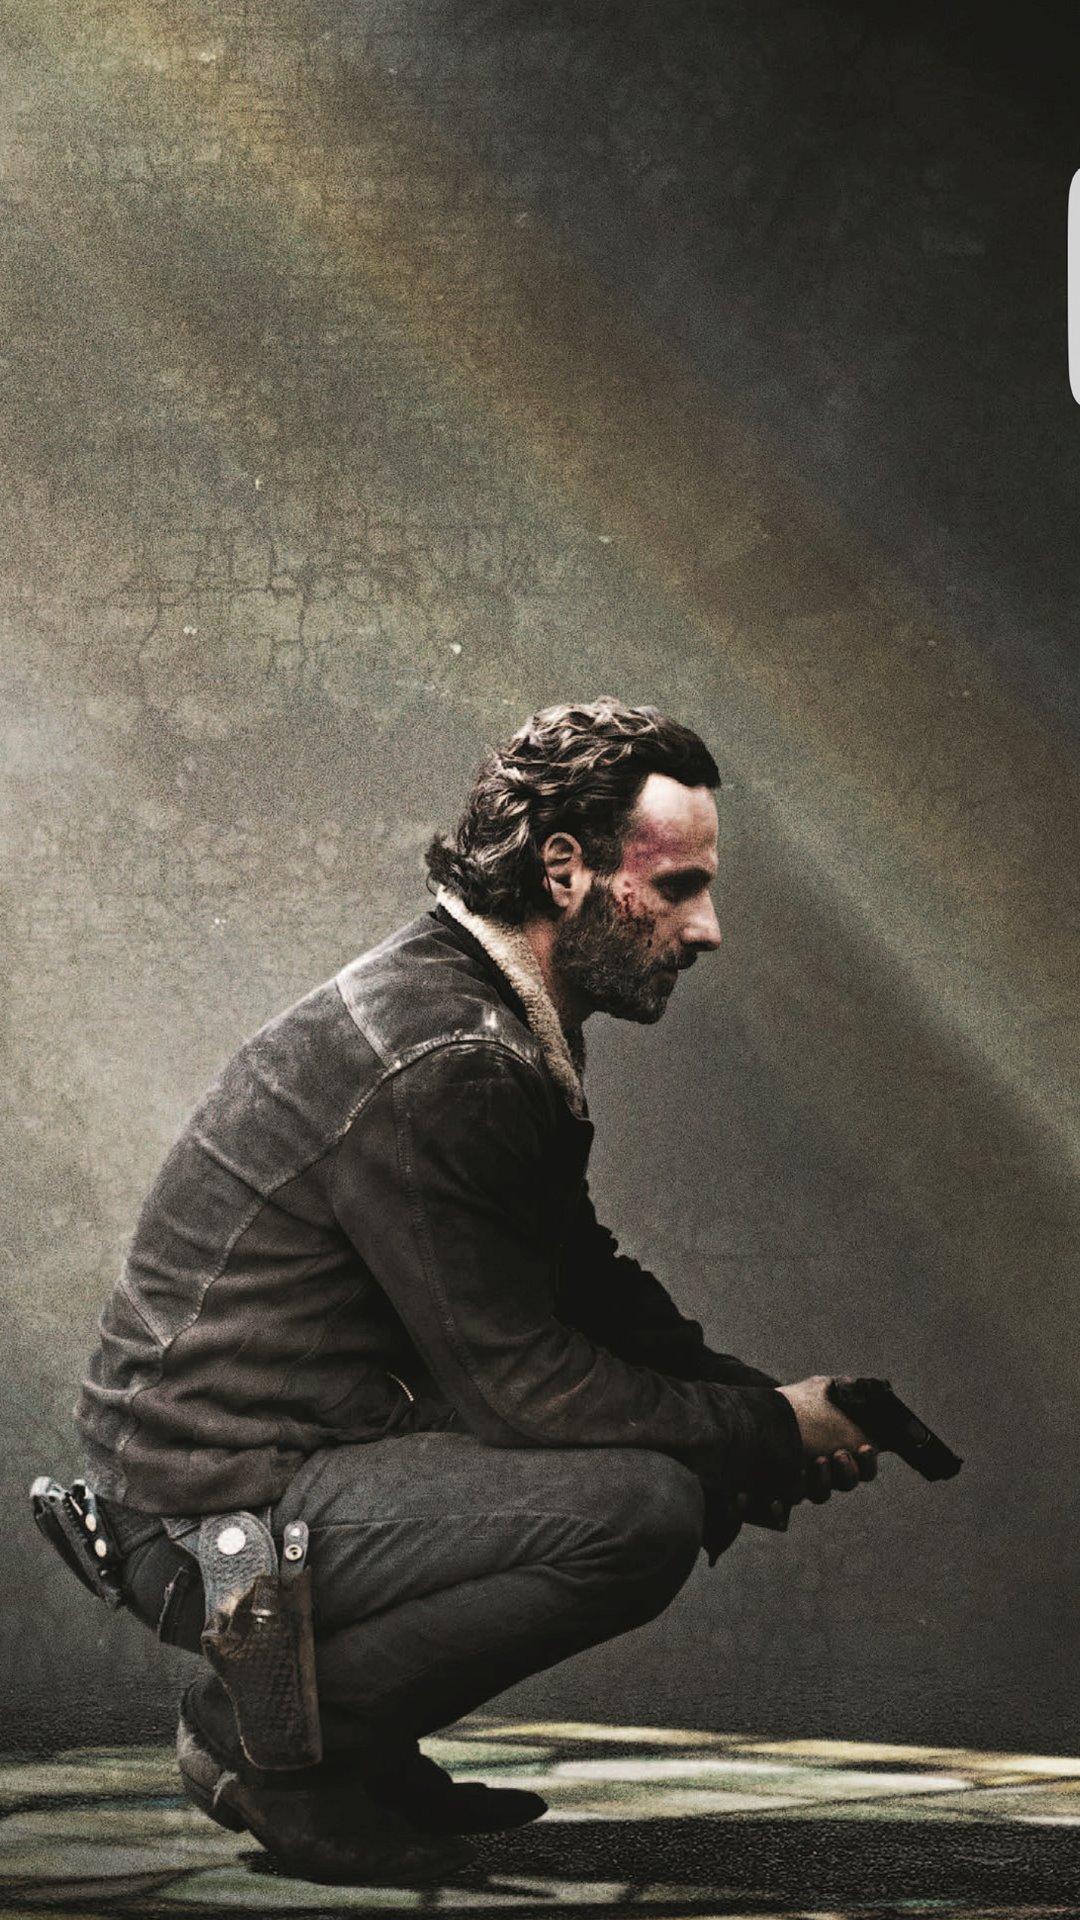 The Walking Dead iPhone 6 Plus Wallpaper (1080x1920)